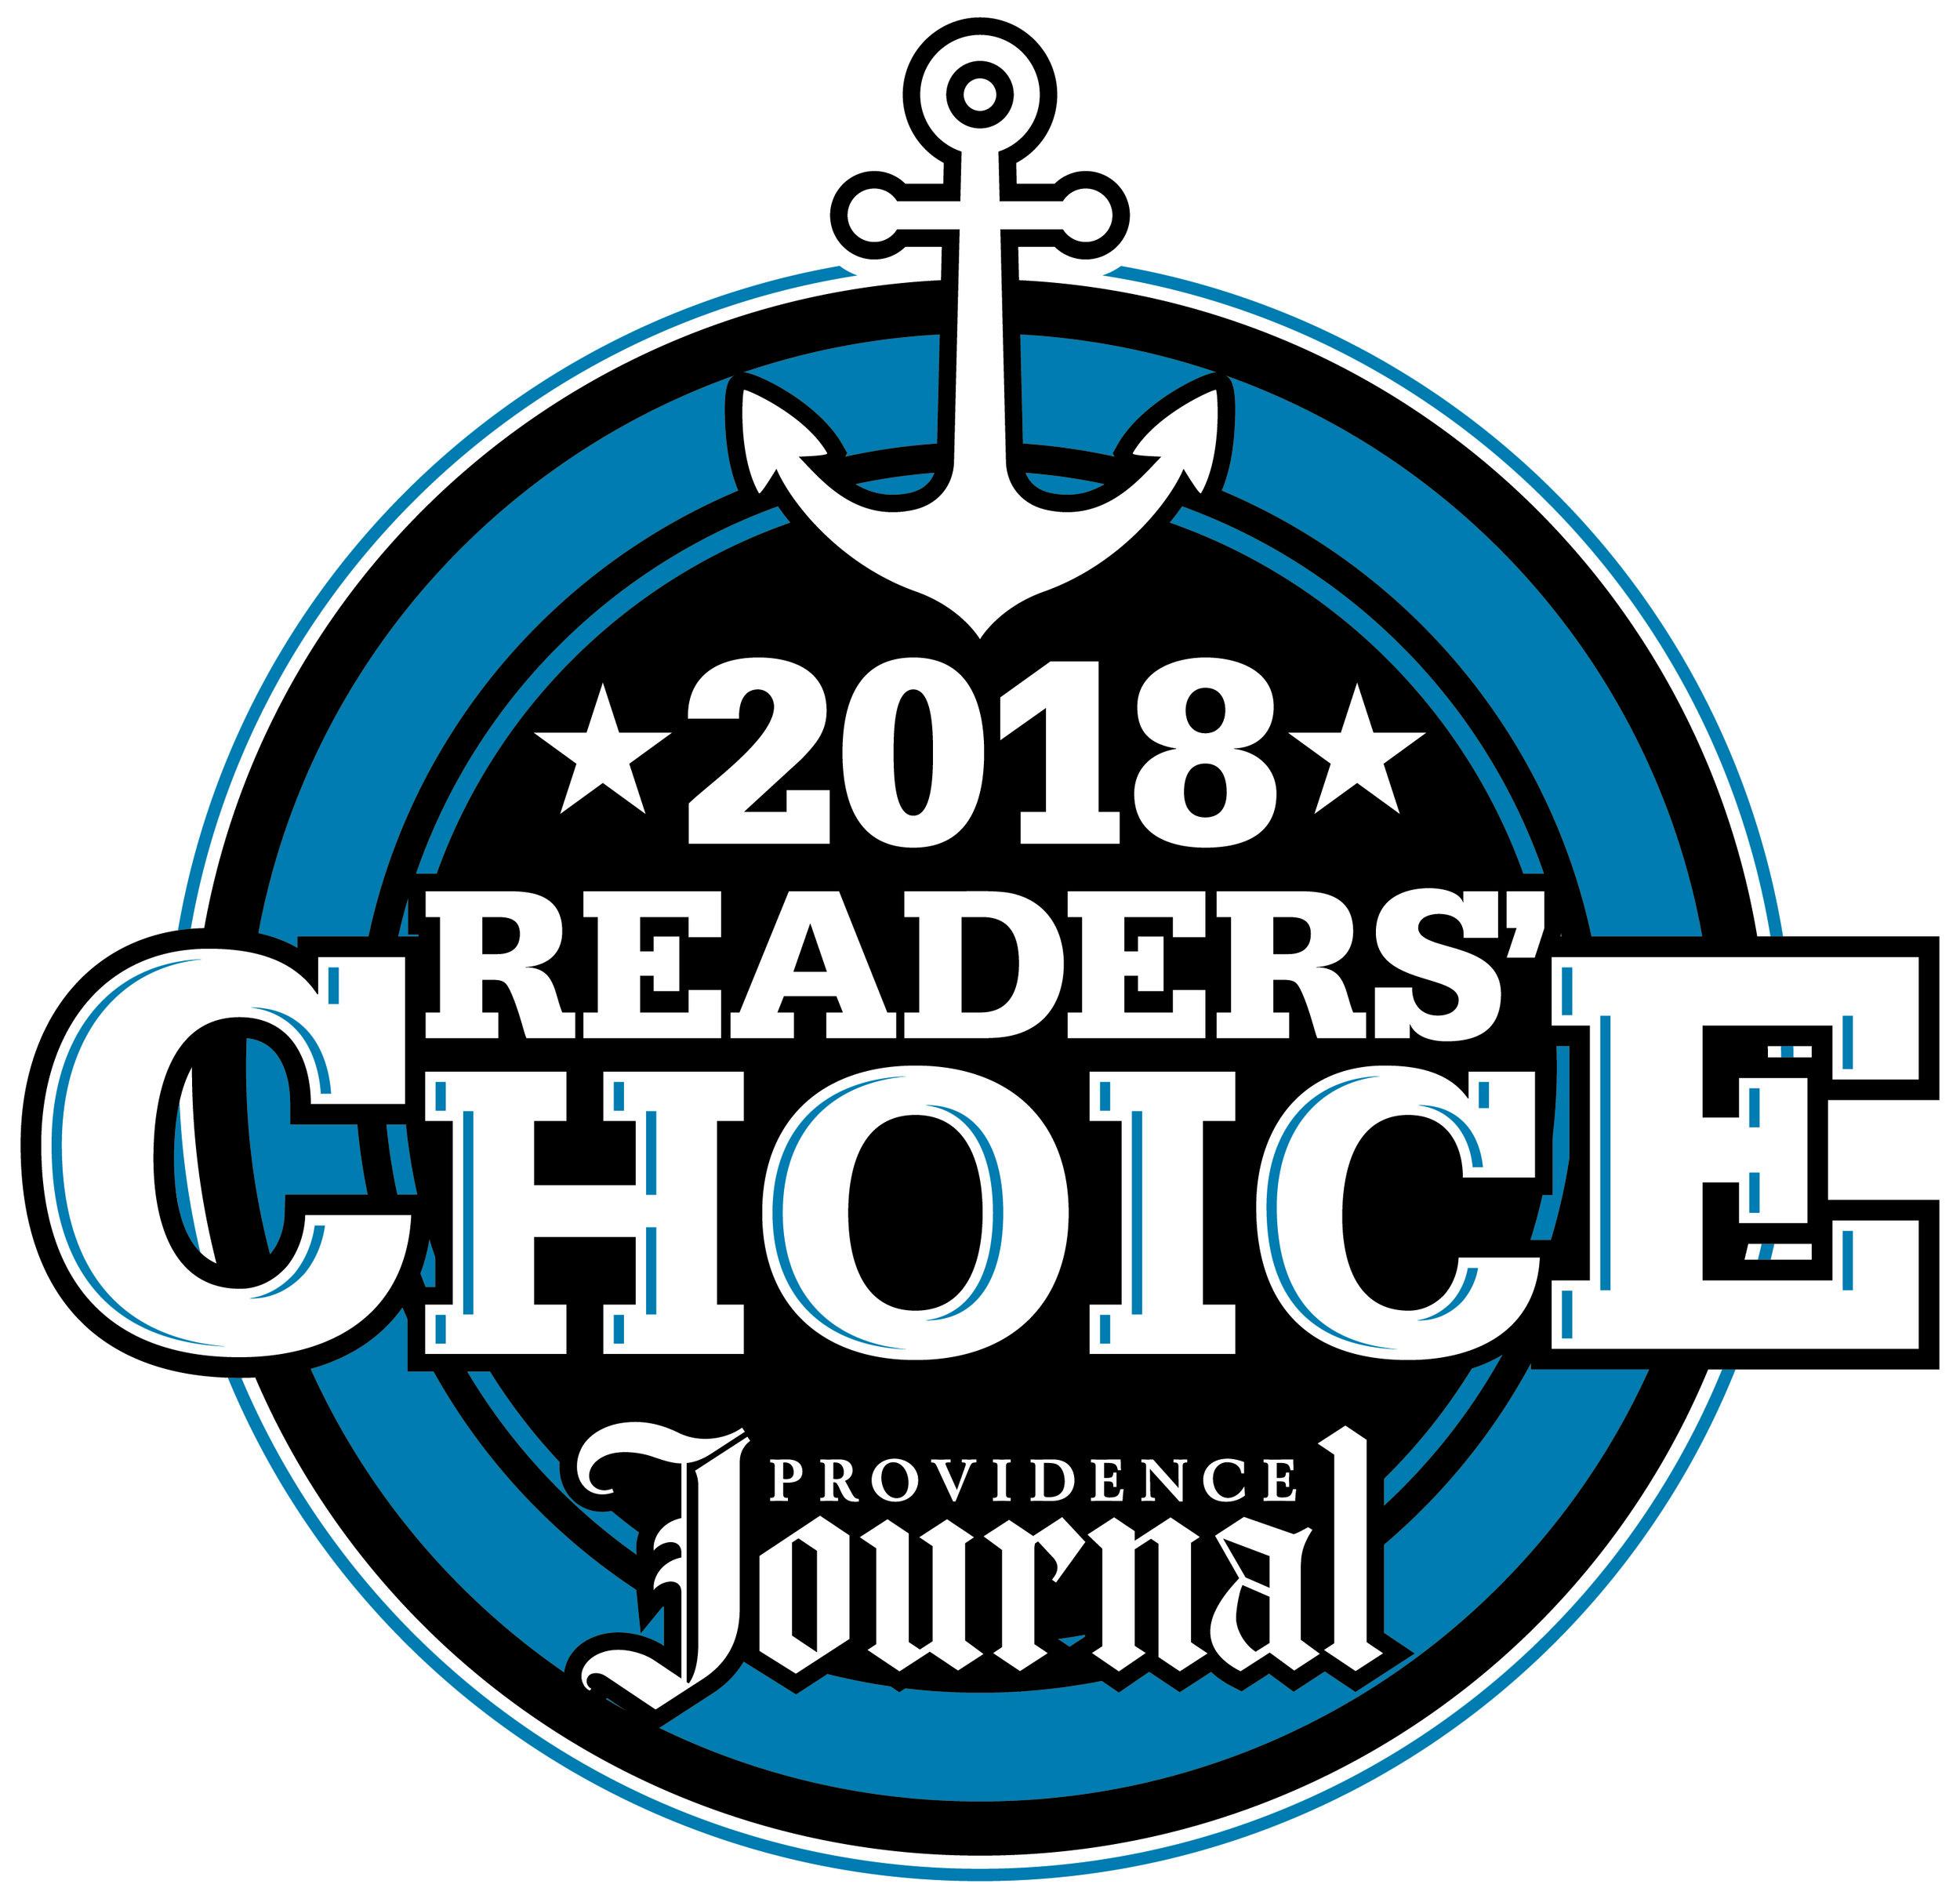 2018-Readers27-Choice-Logo.jpg